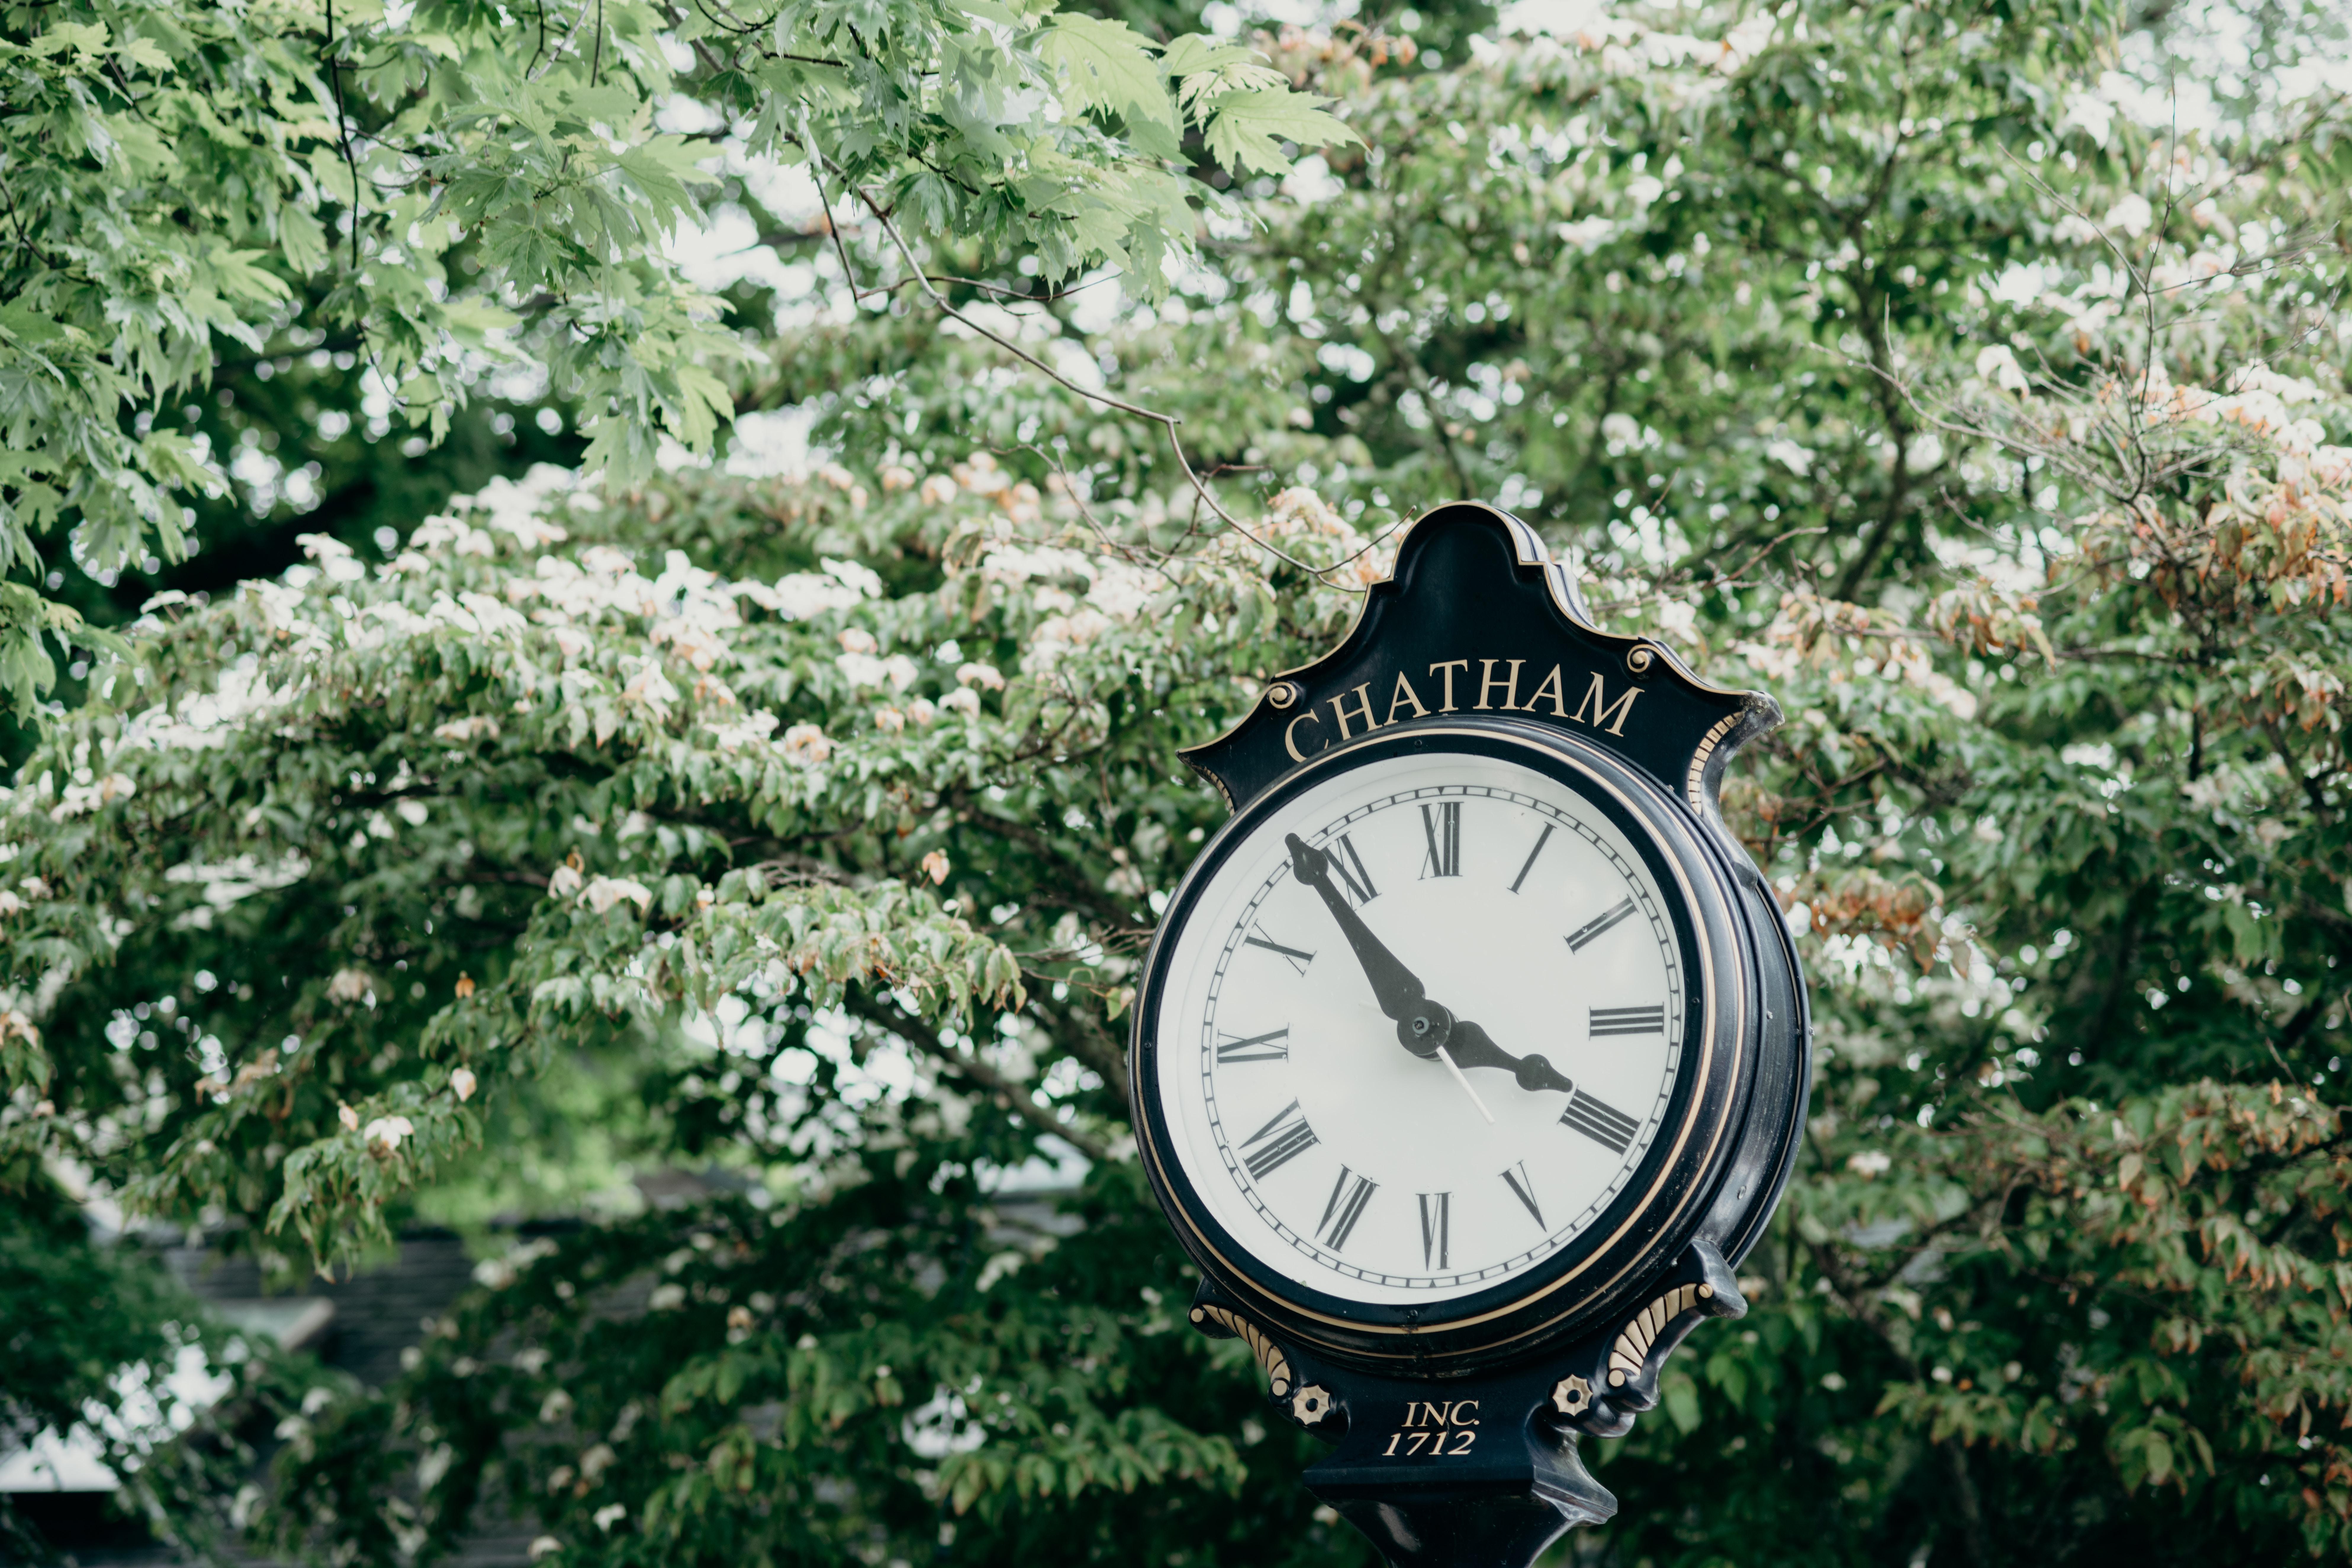 road Charham street clock beside trees